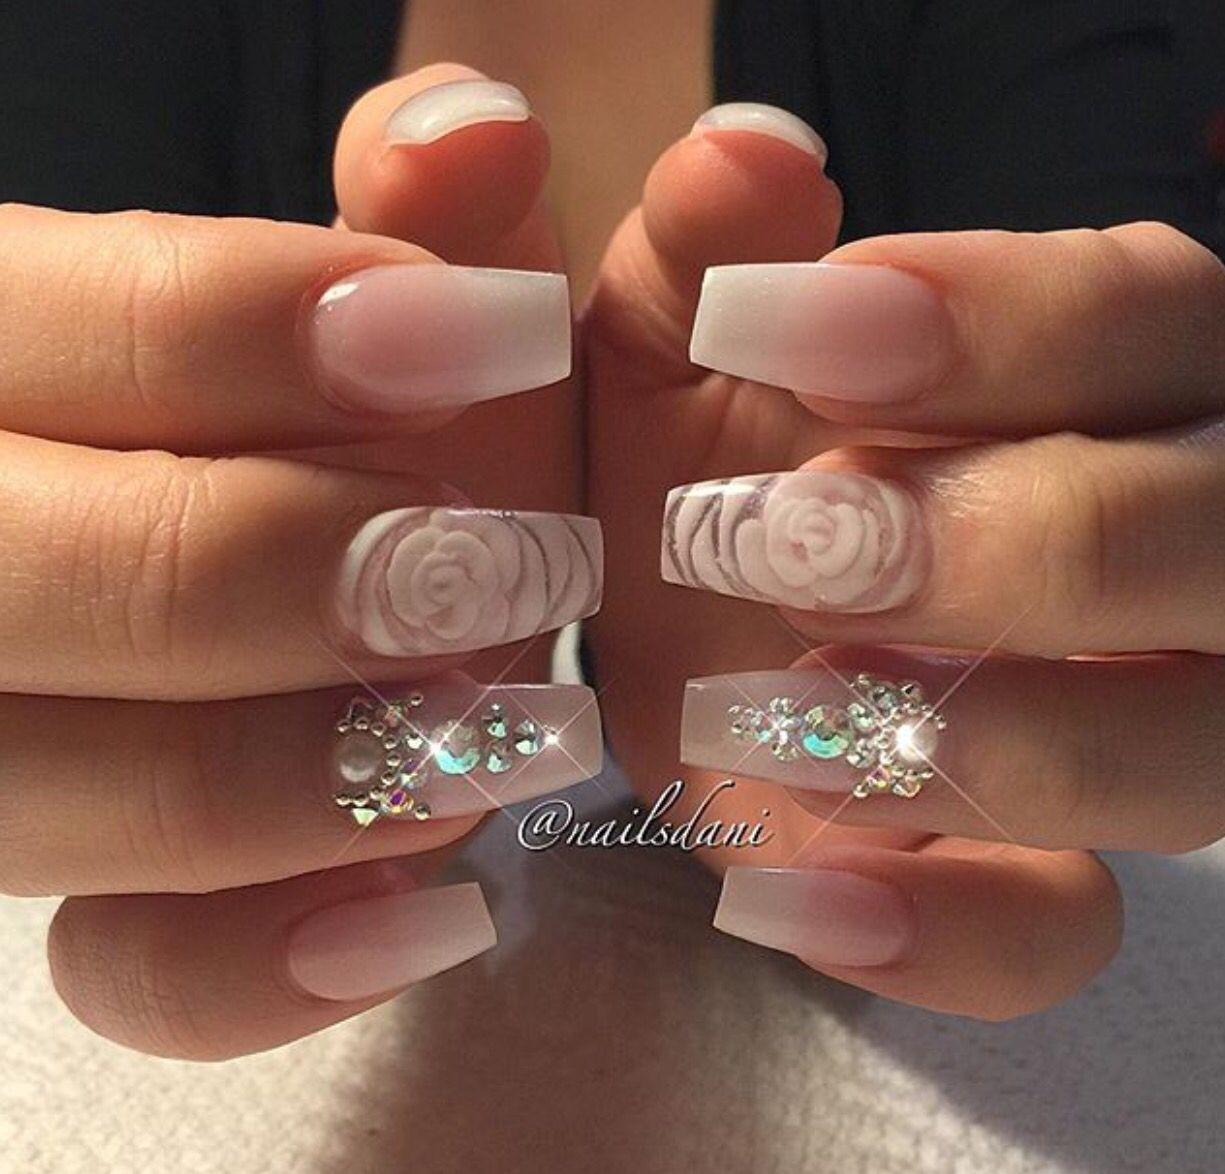 Rhinestones & Flower Nails